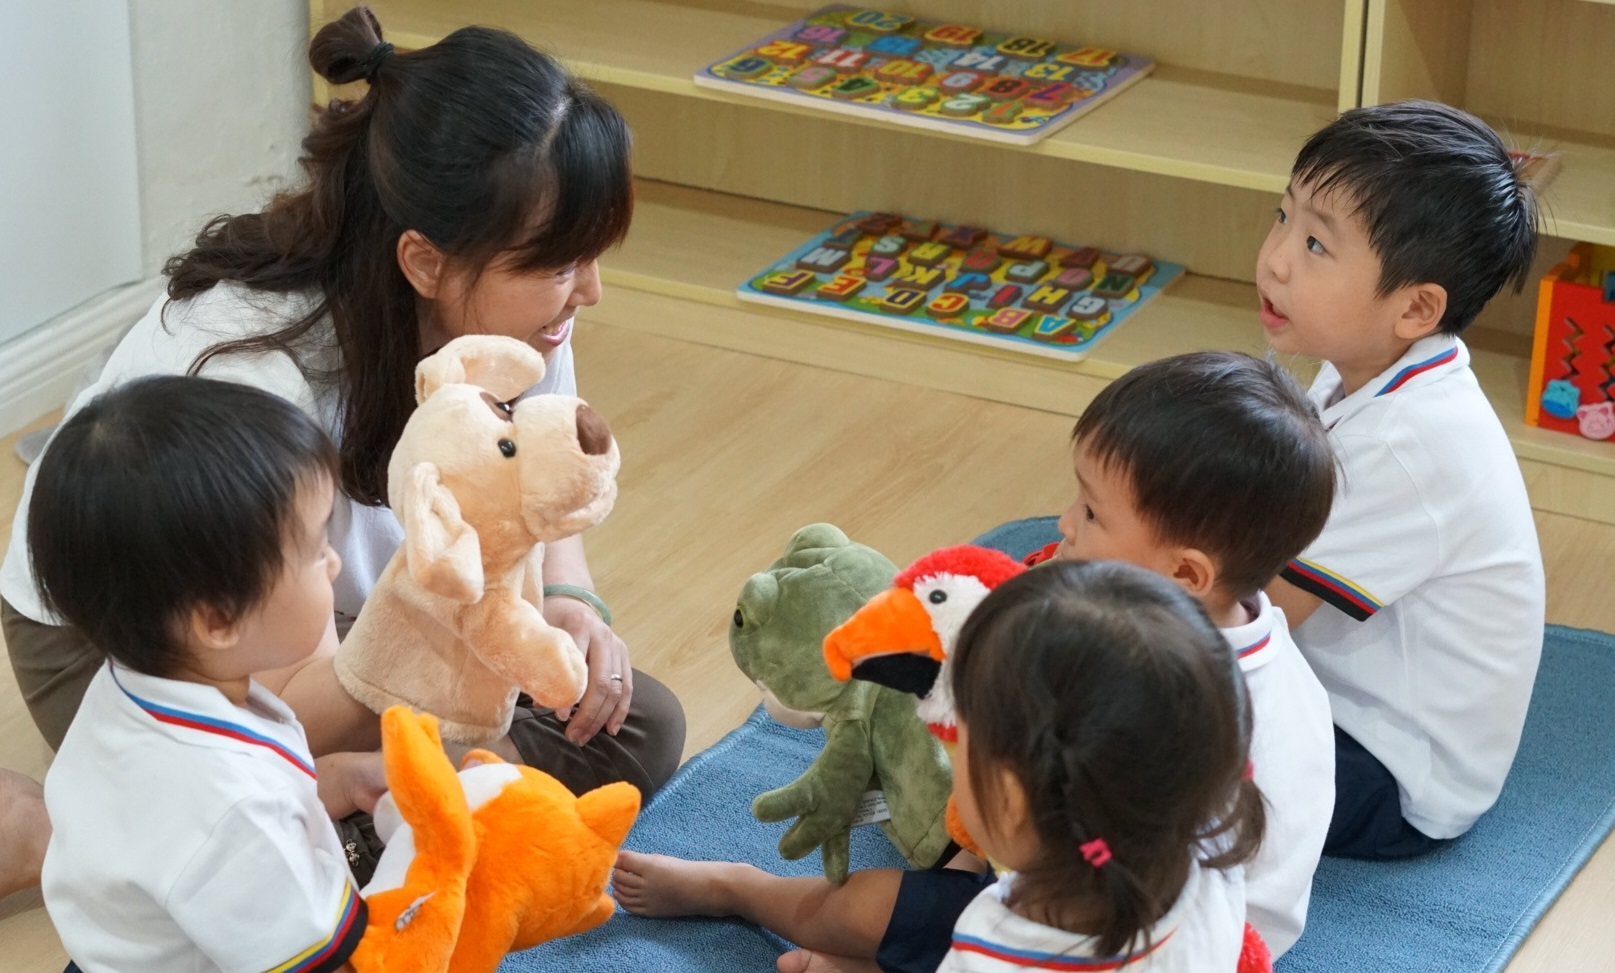 School Tour: Mondrian International Schoolhouse @ Bishan